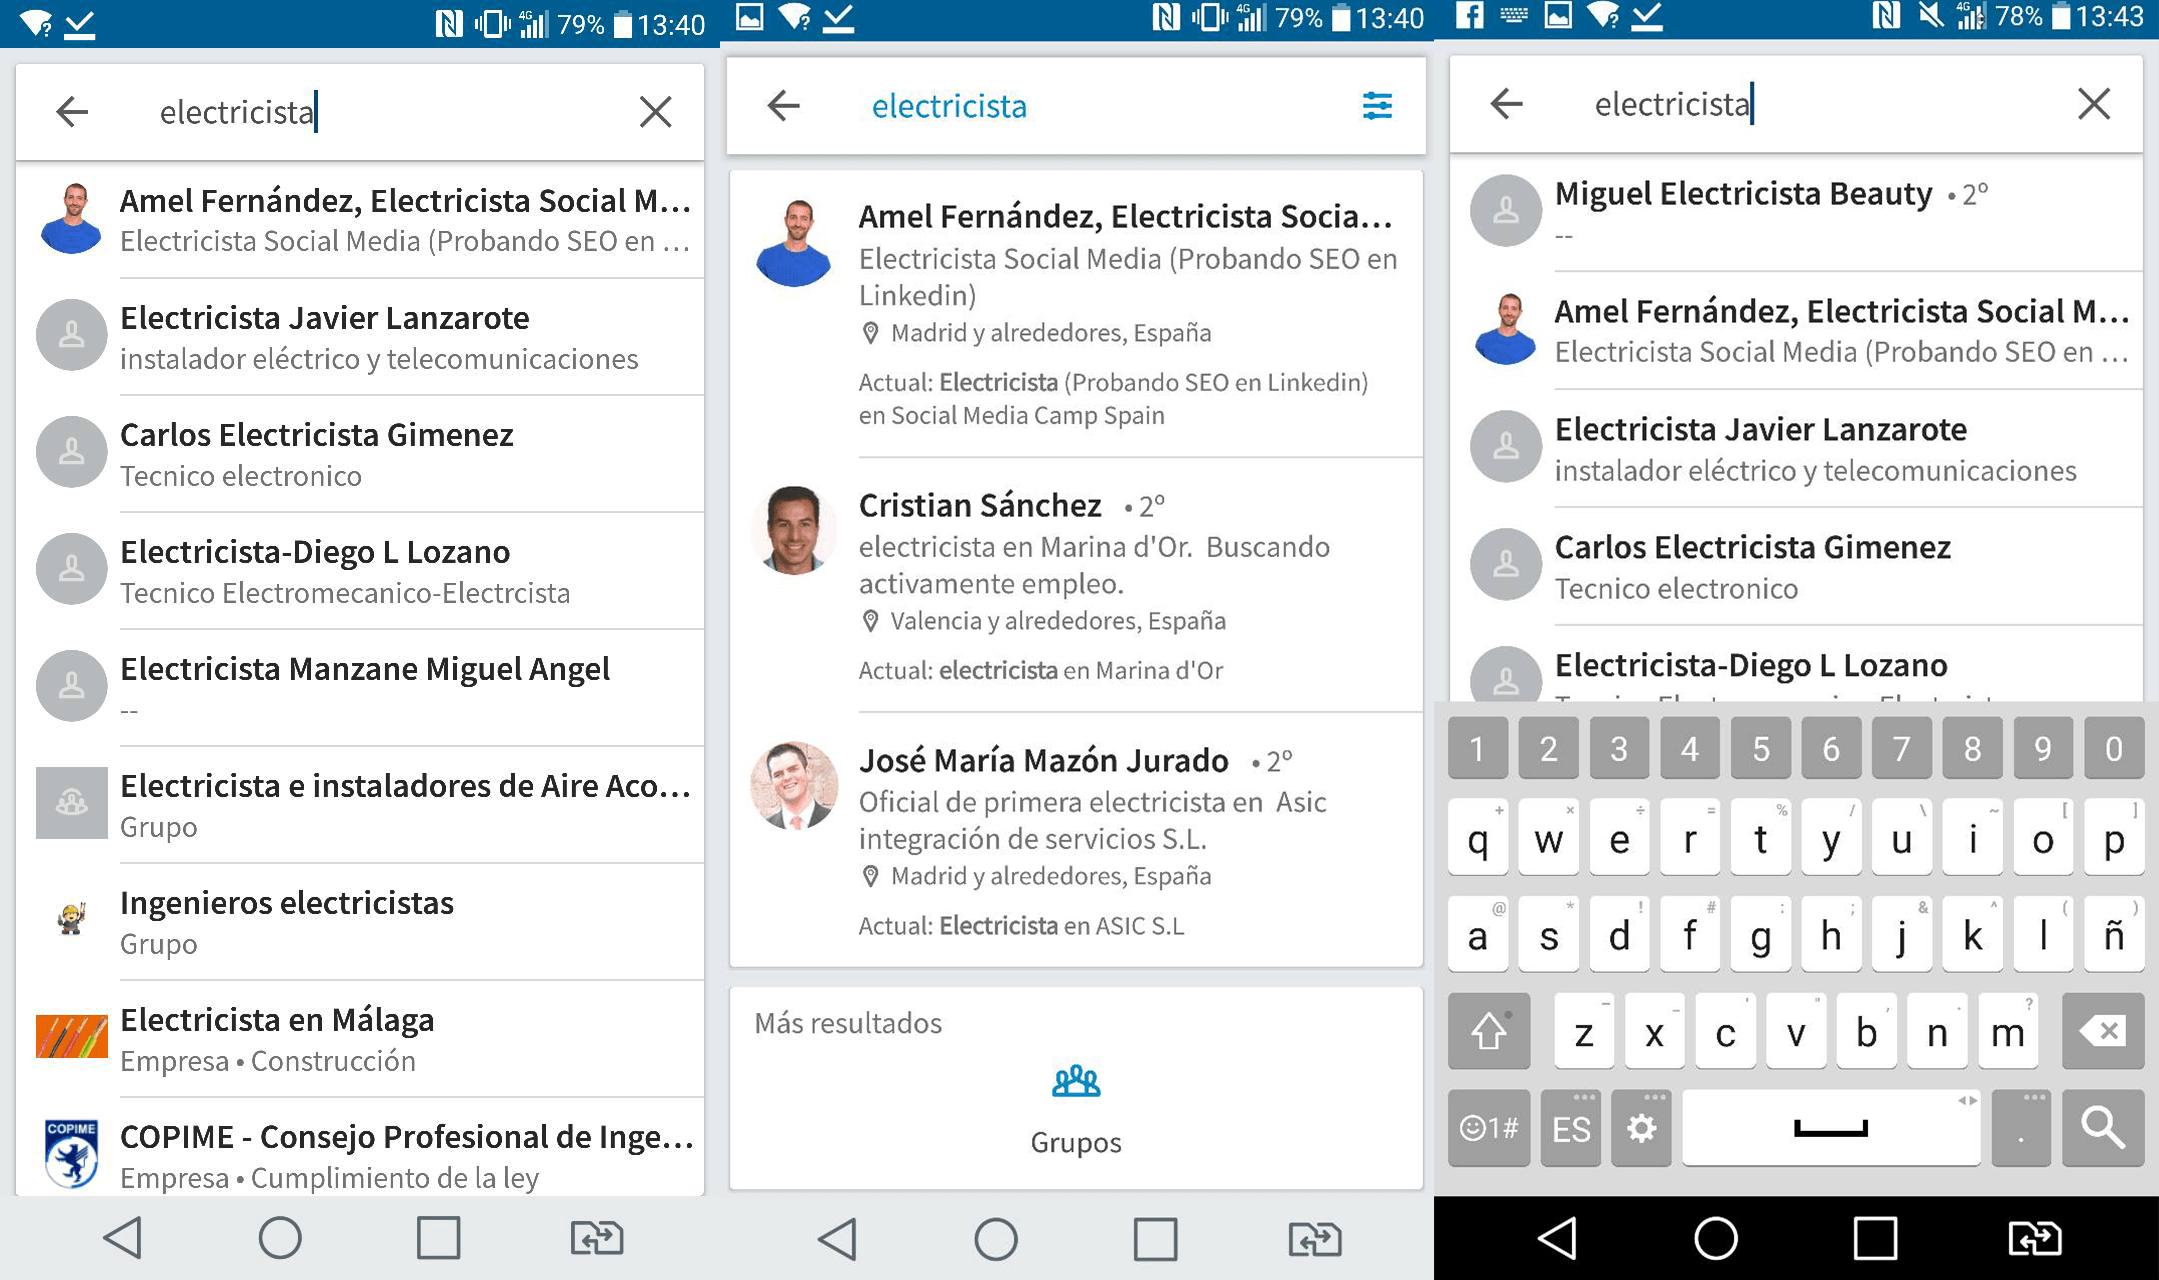 SEO en Linkedin - Electricista 4